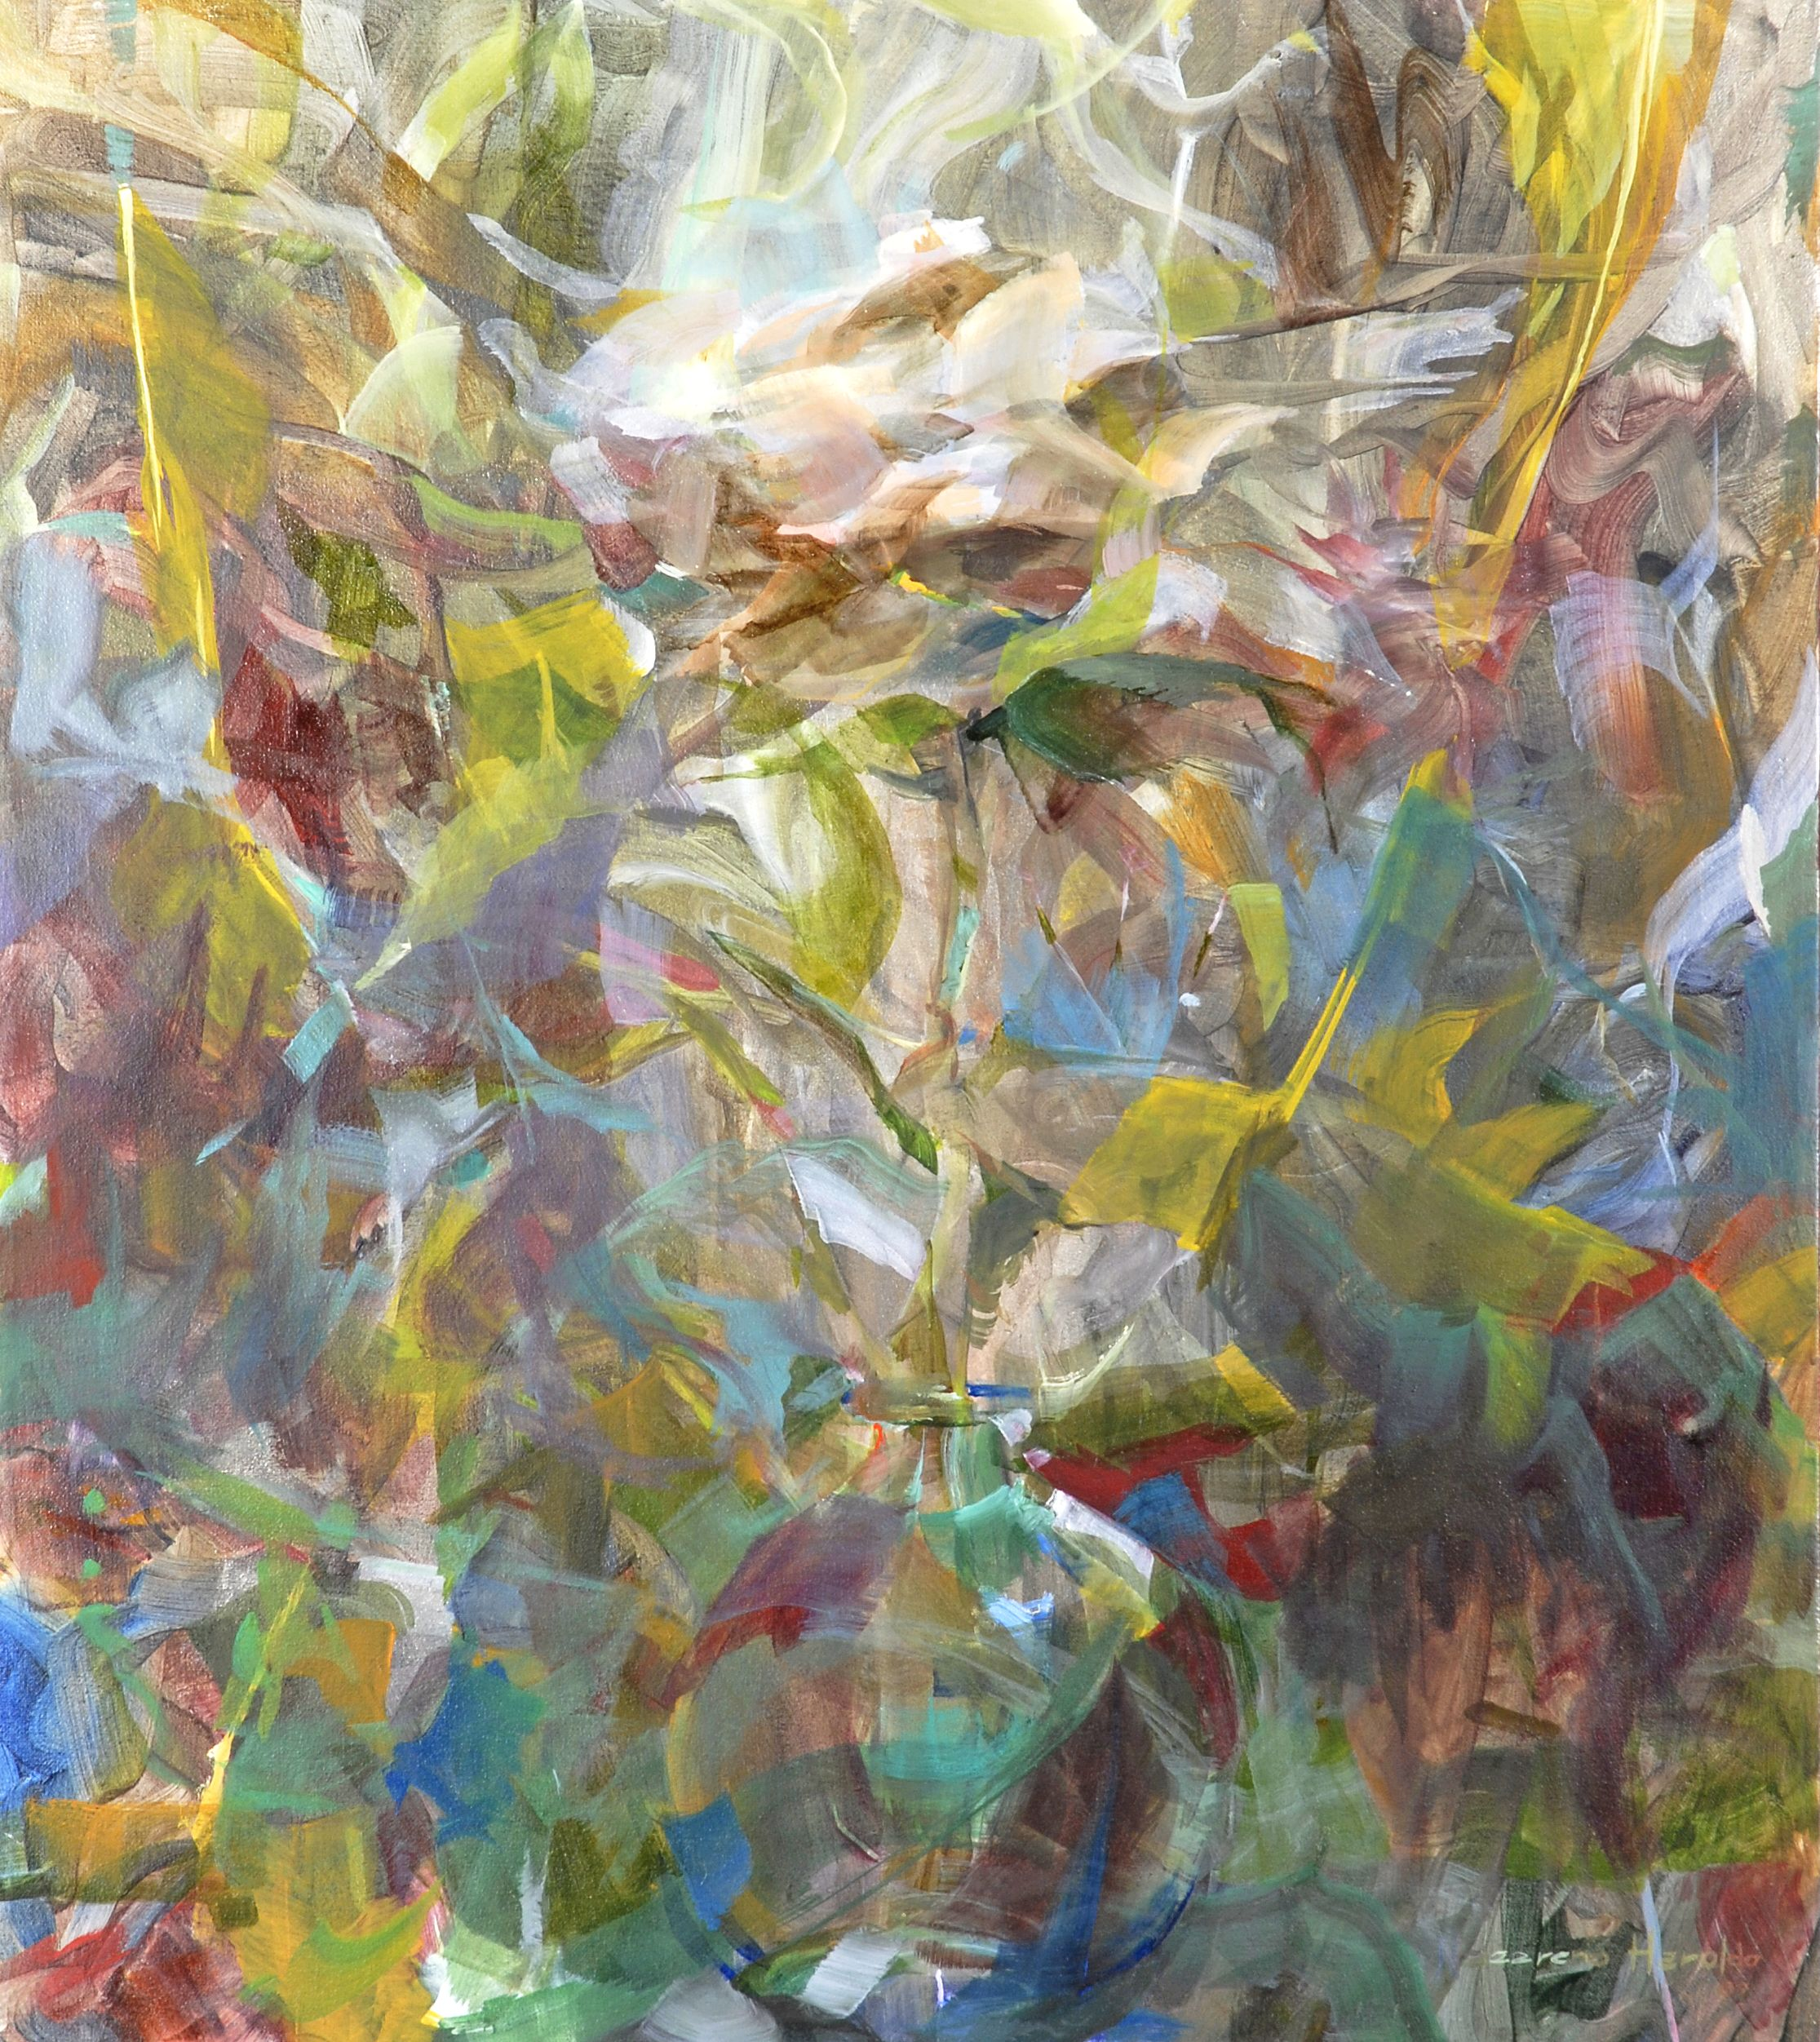 Oil on canvas 70 x 80 cm